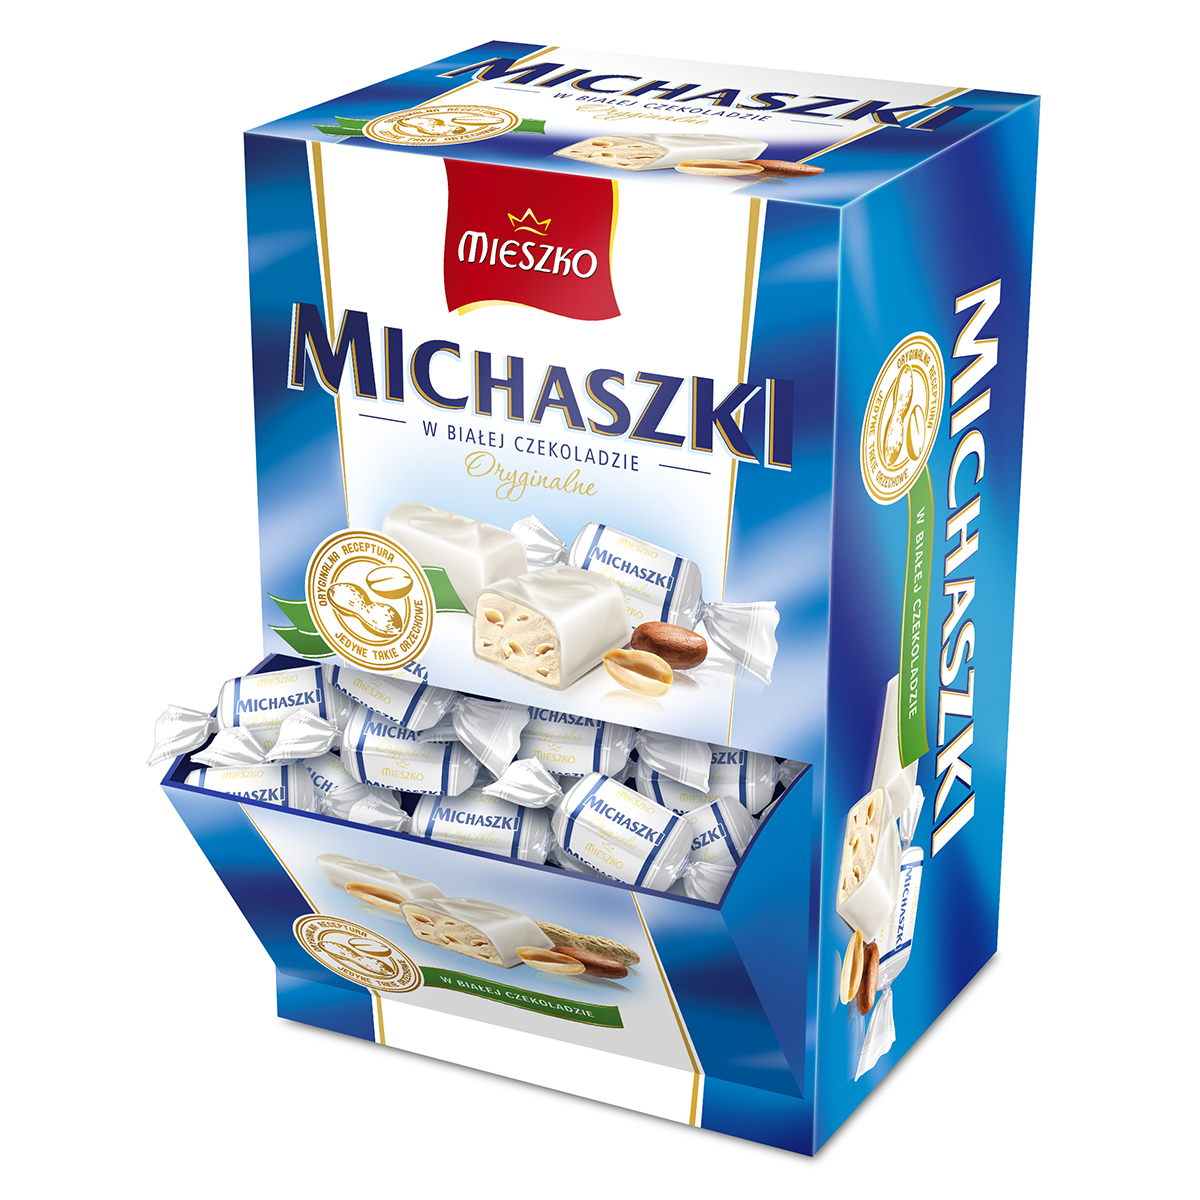 michaszki_9